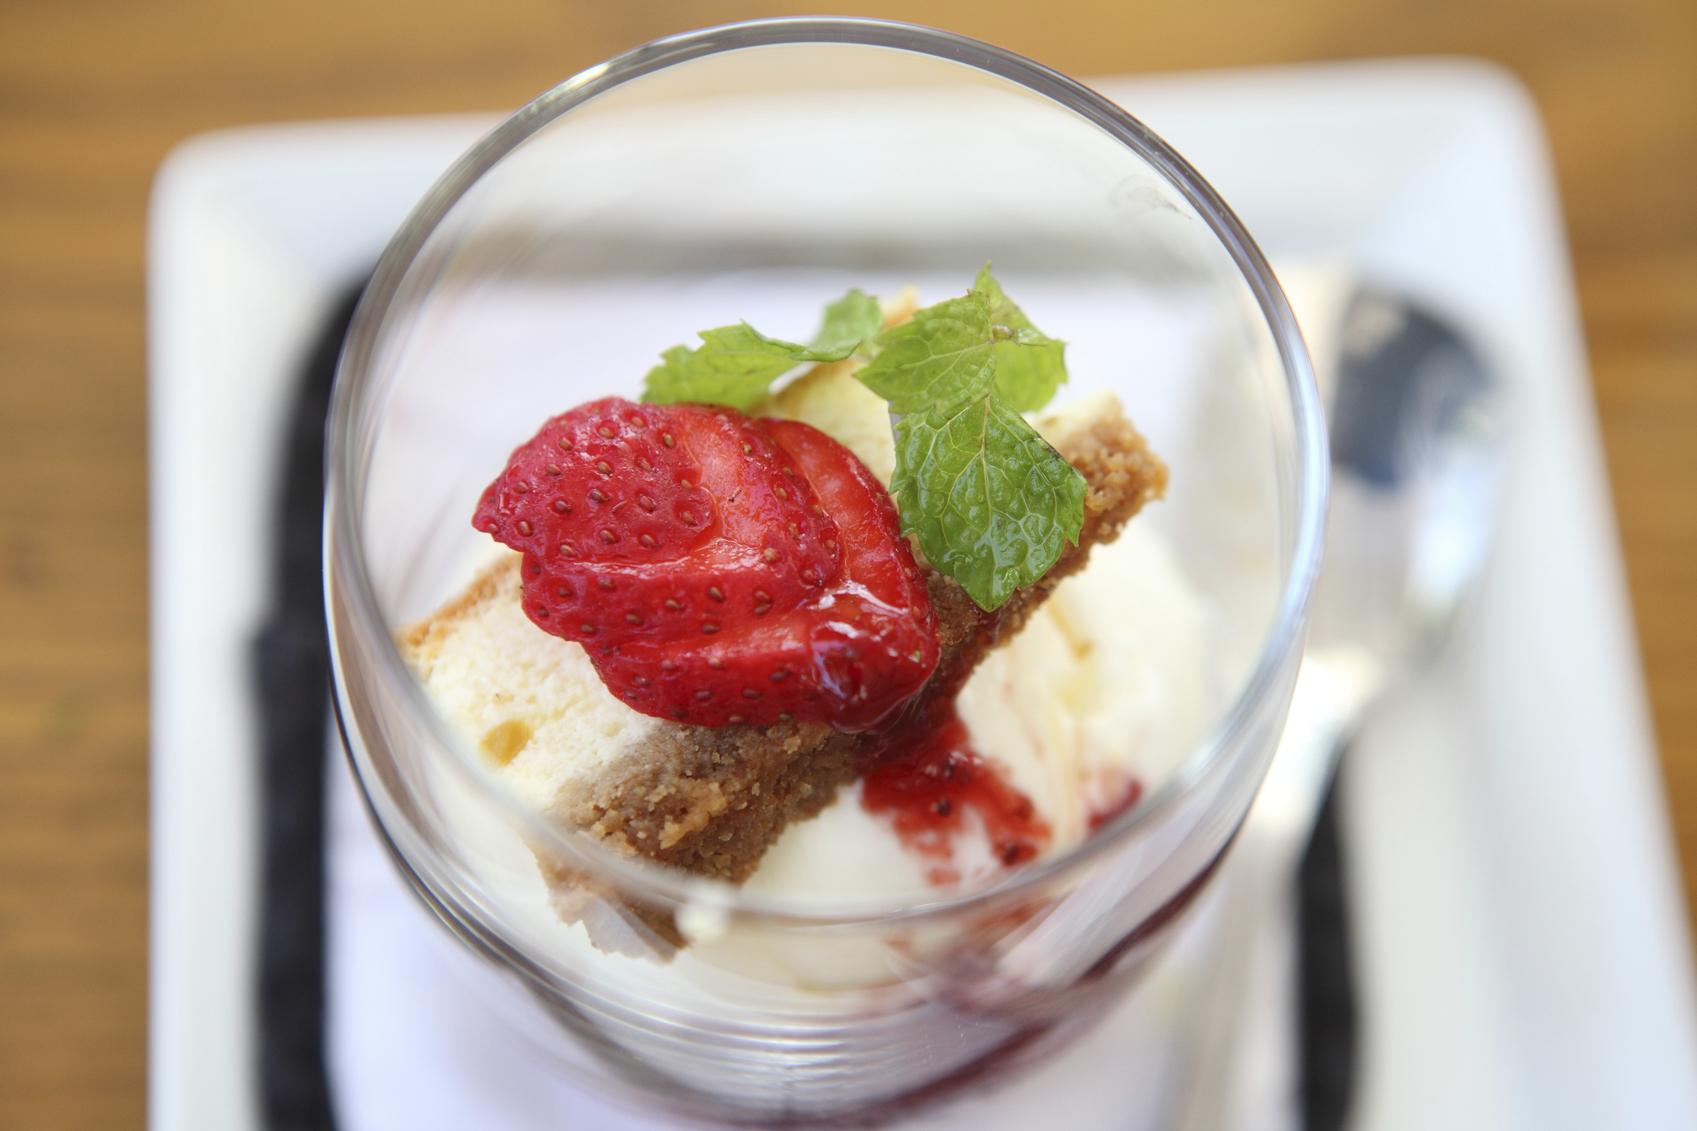 strawberry icecream with cheese cake